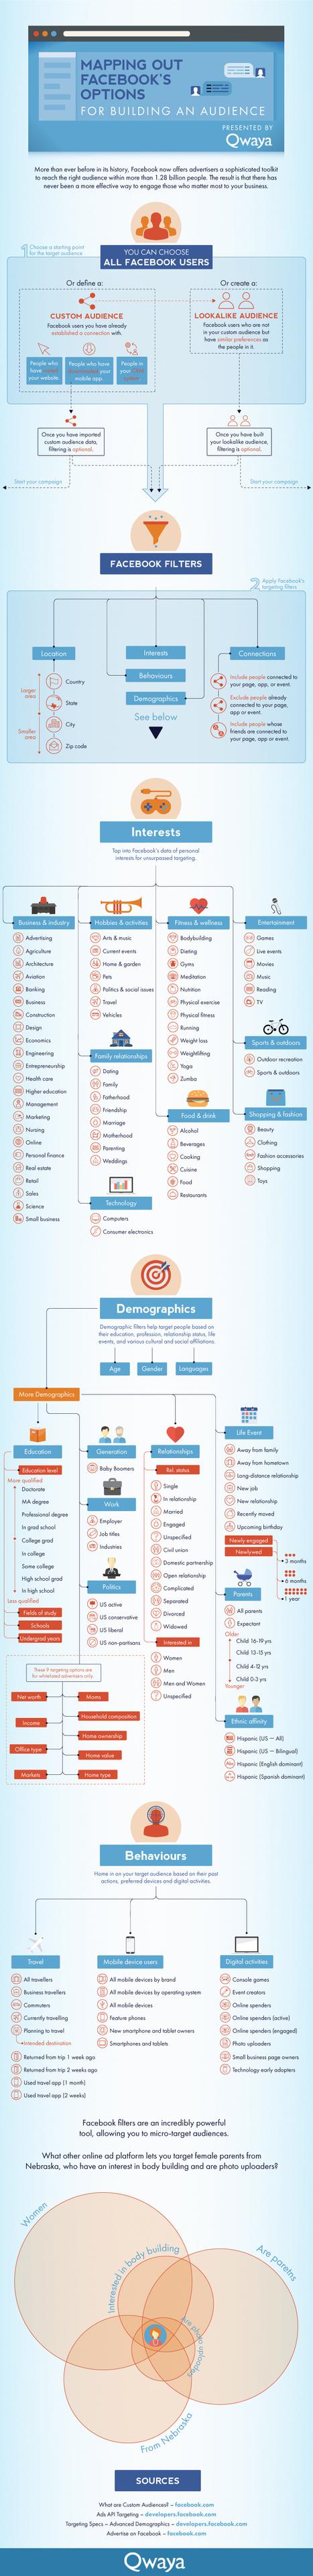 A Guide to Facebook's Advertising Targeting Options | Social Media & Social Media Marketing | Scoop.it